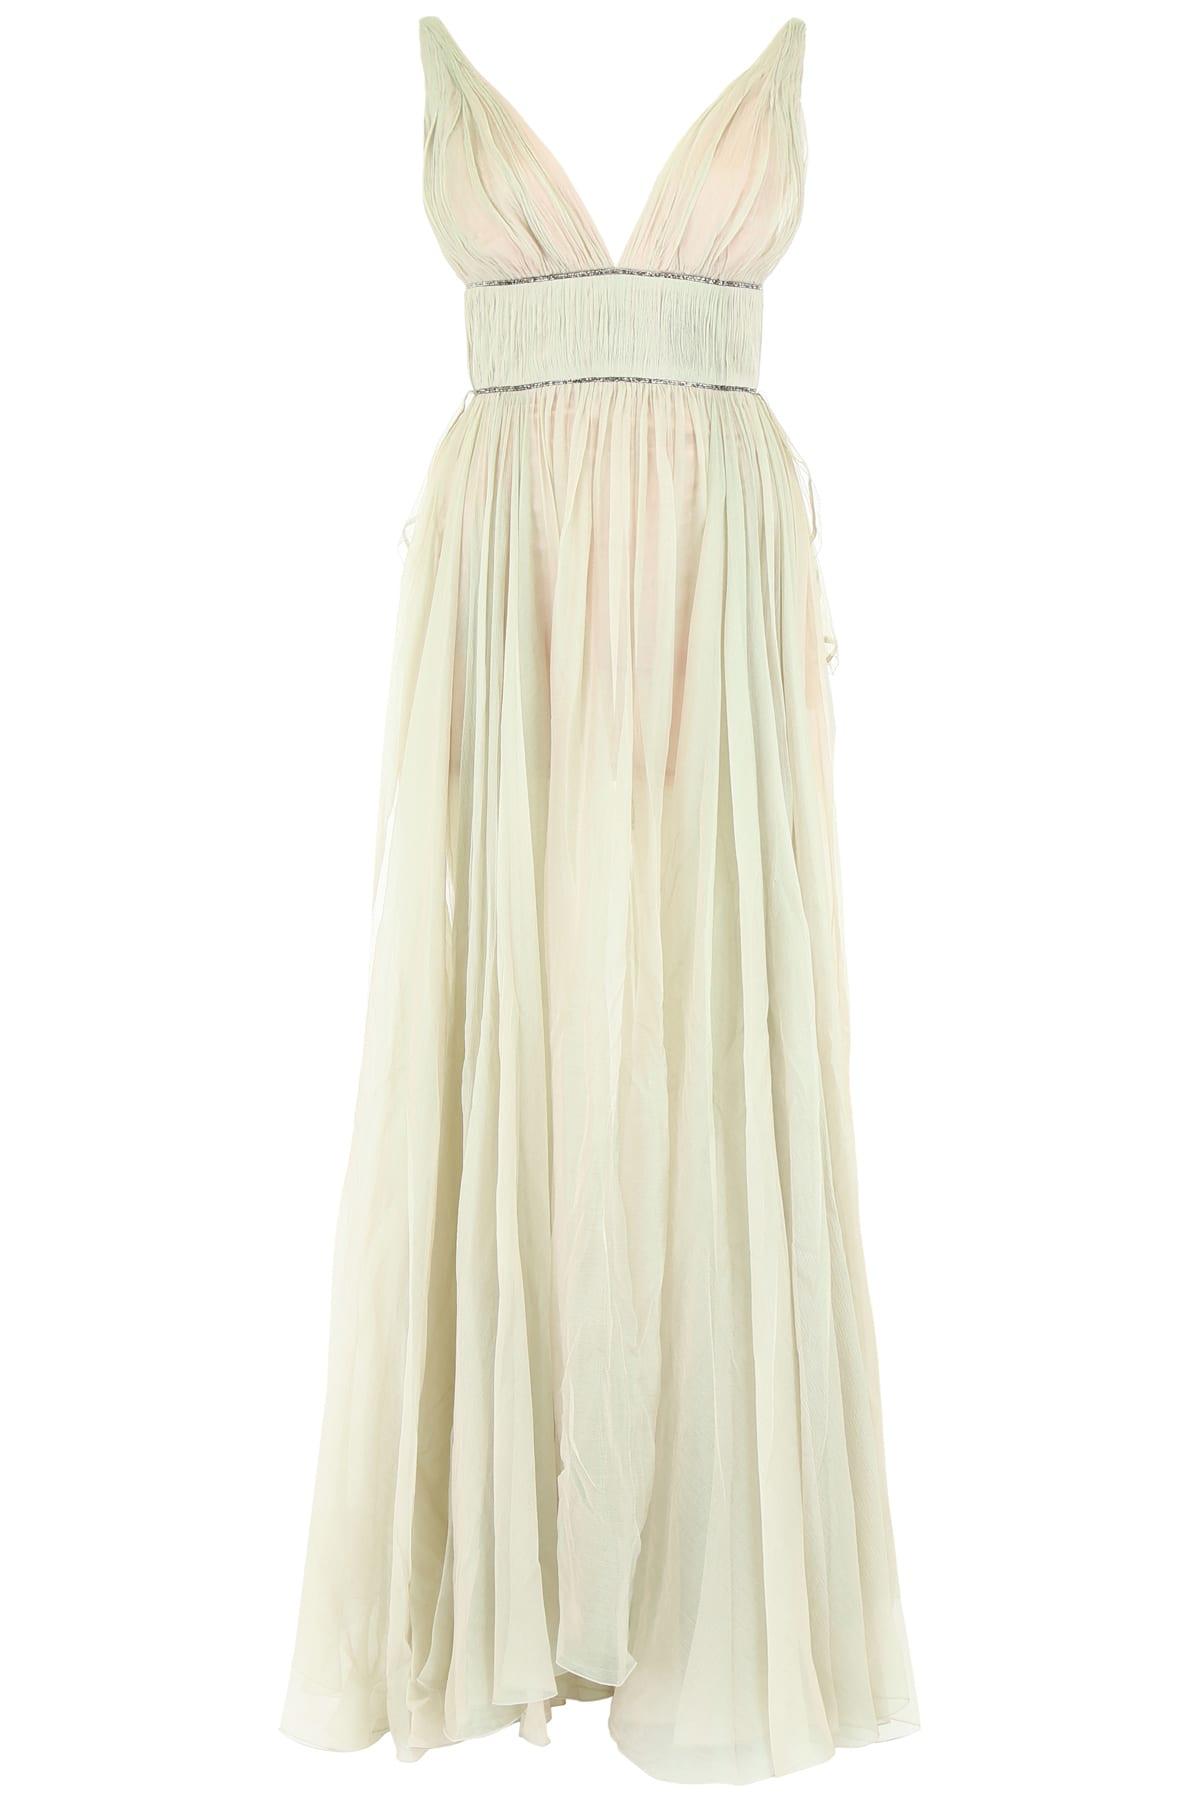 Maria Lucia Hohan Sage Silk And Crystal Dress